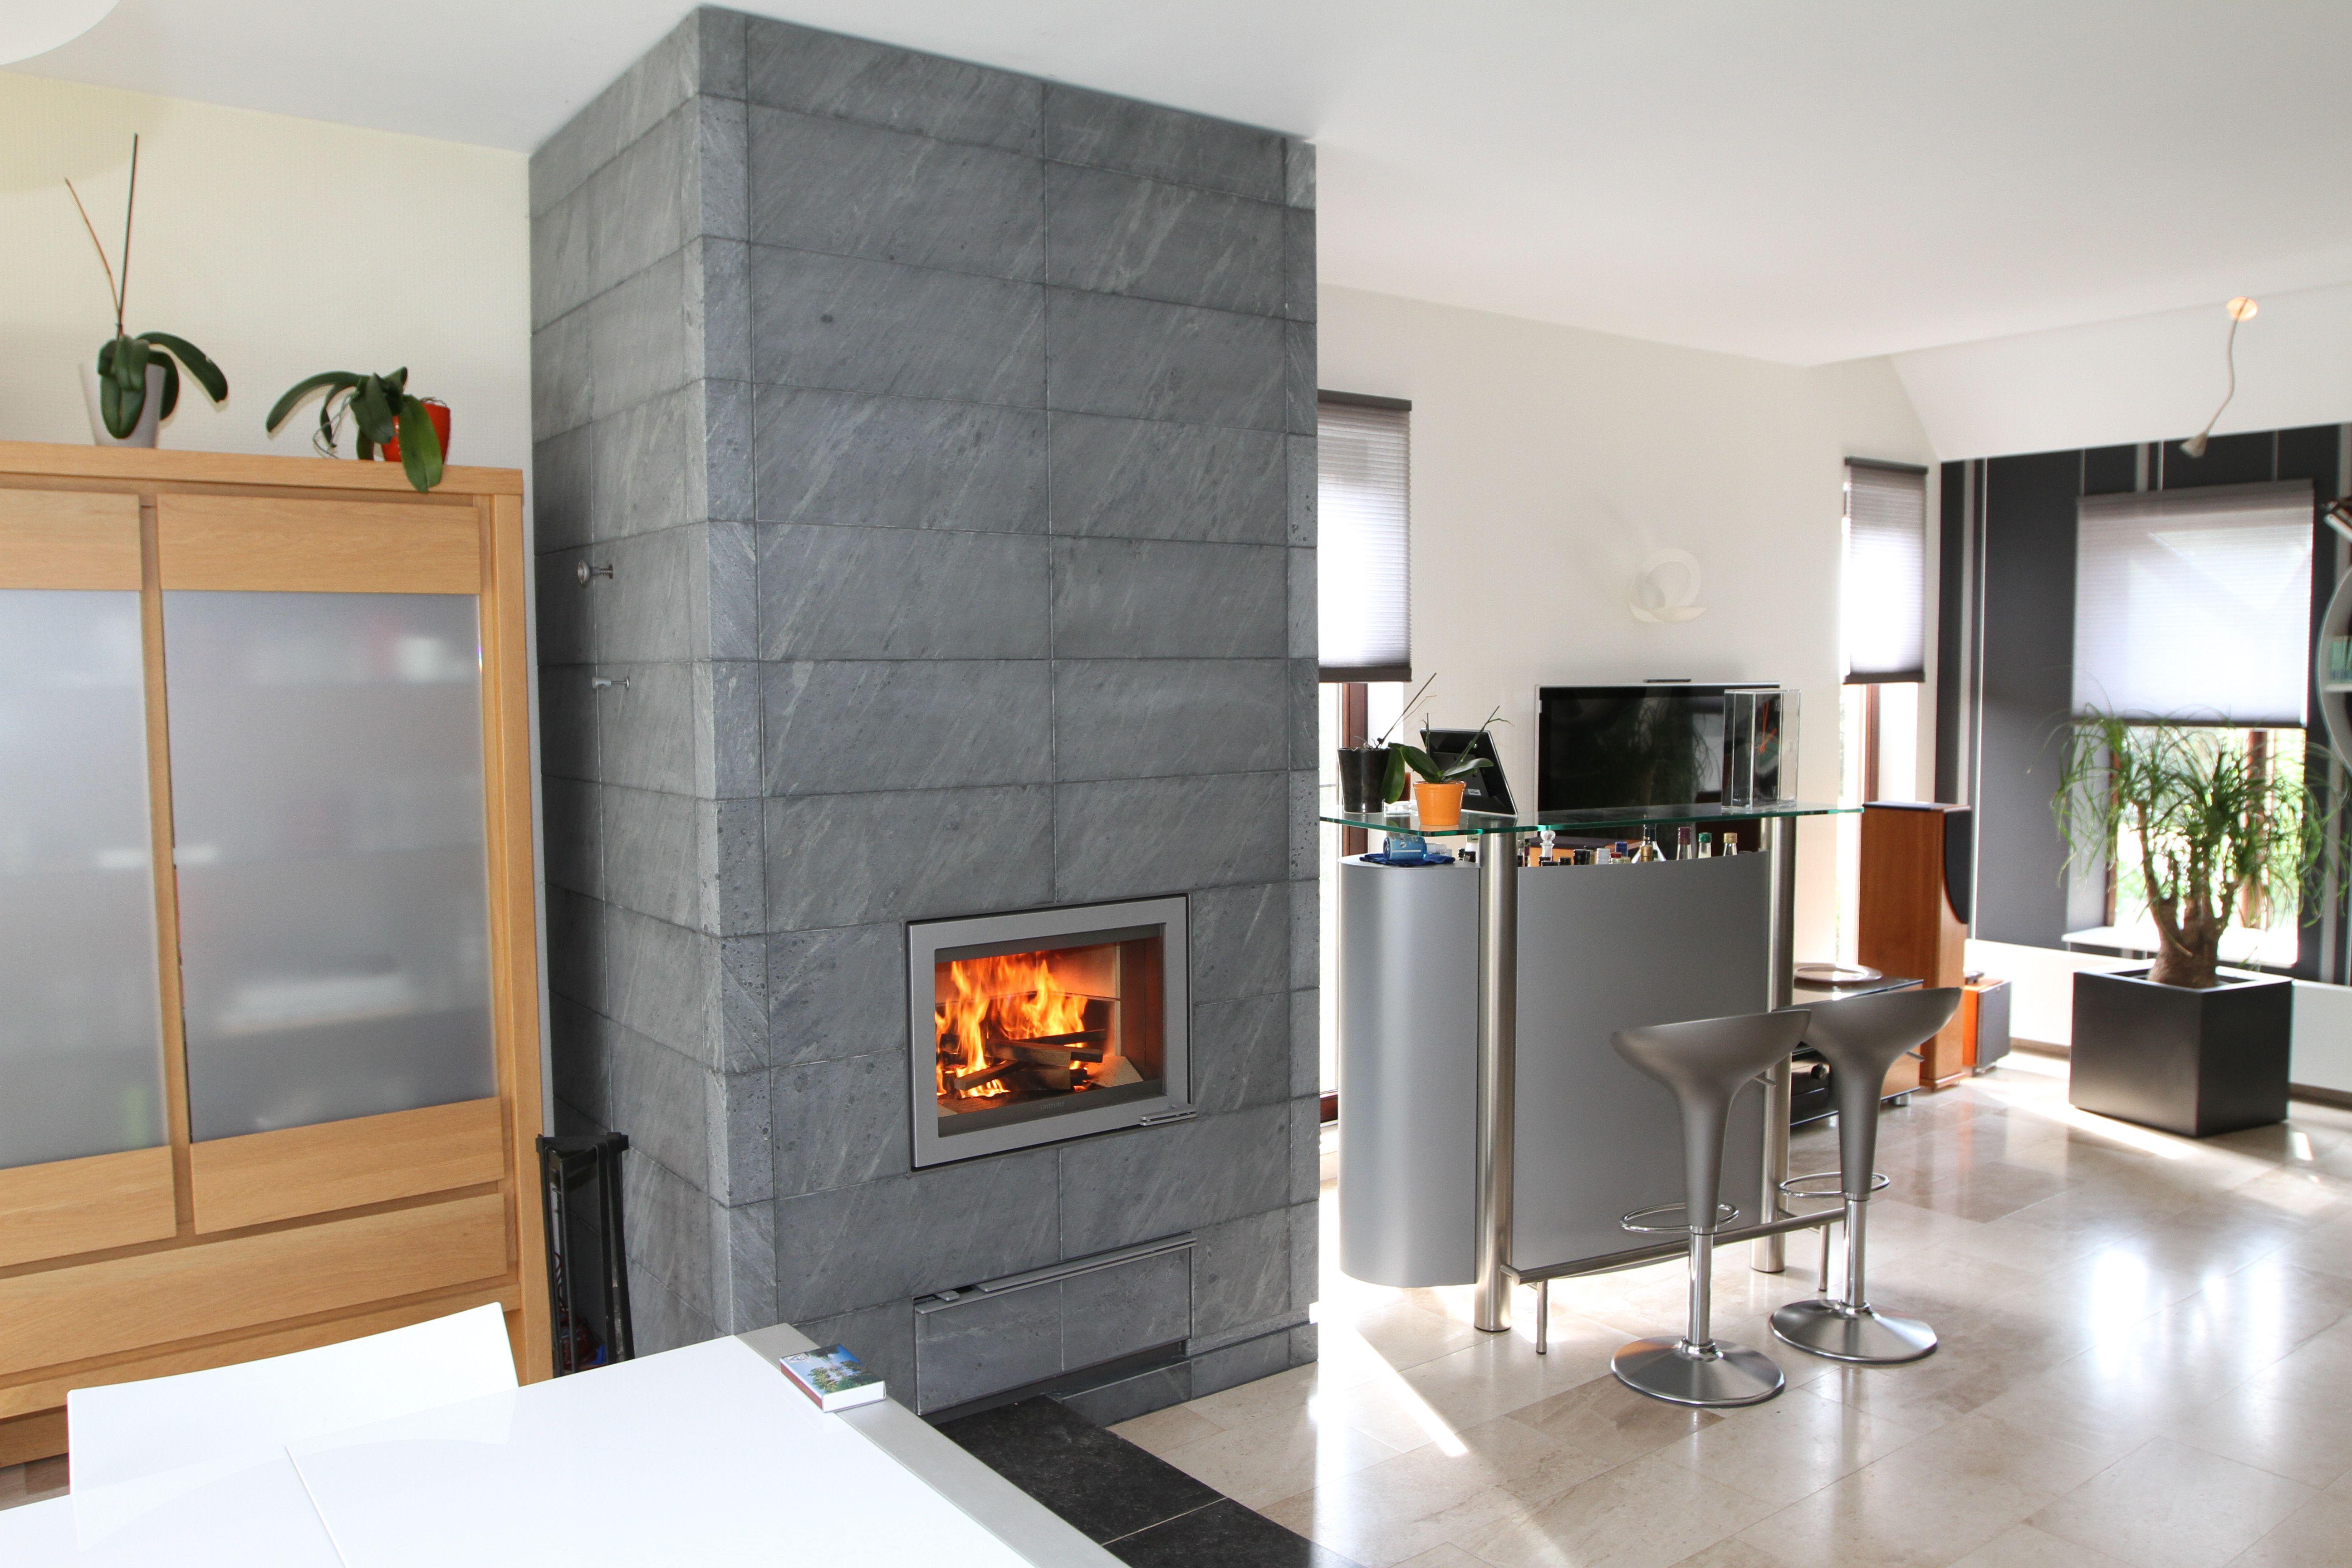 po le de masse tulikivi mesure sur base d 39 un valkia art. Black Bedroom Furniture Sets. Home Design Ideas